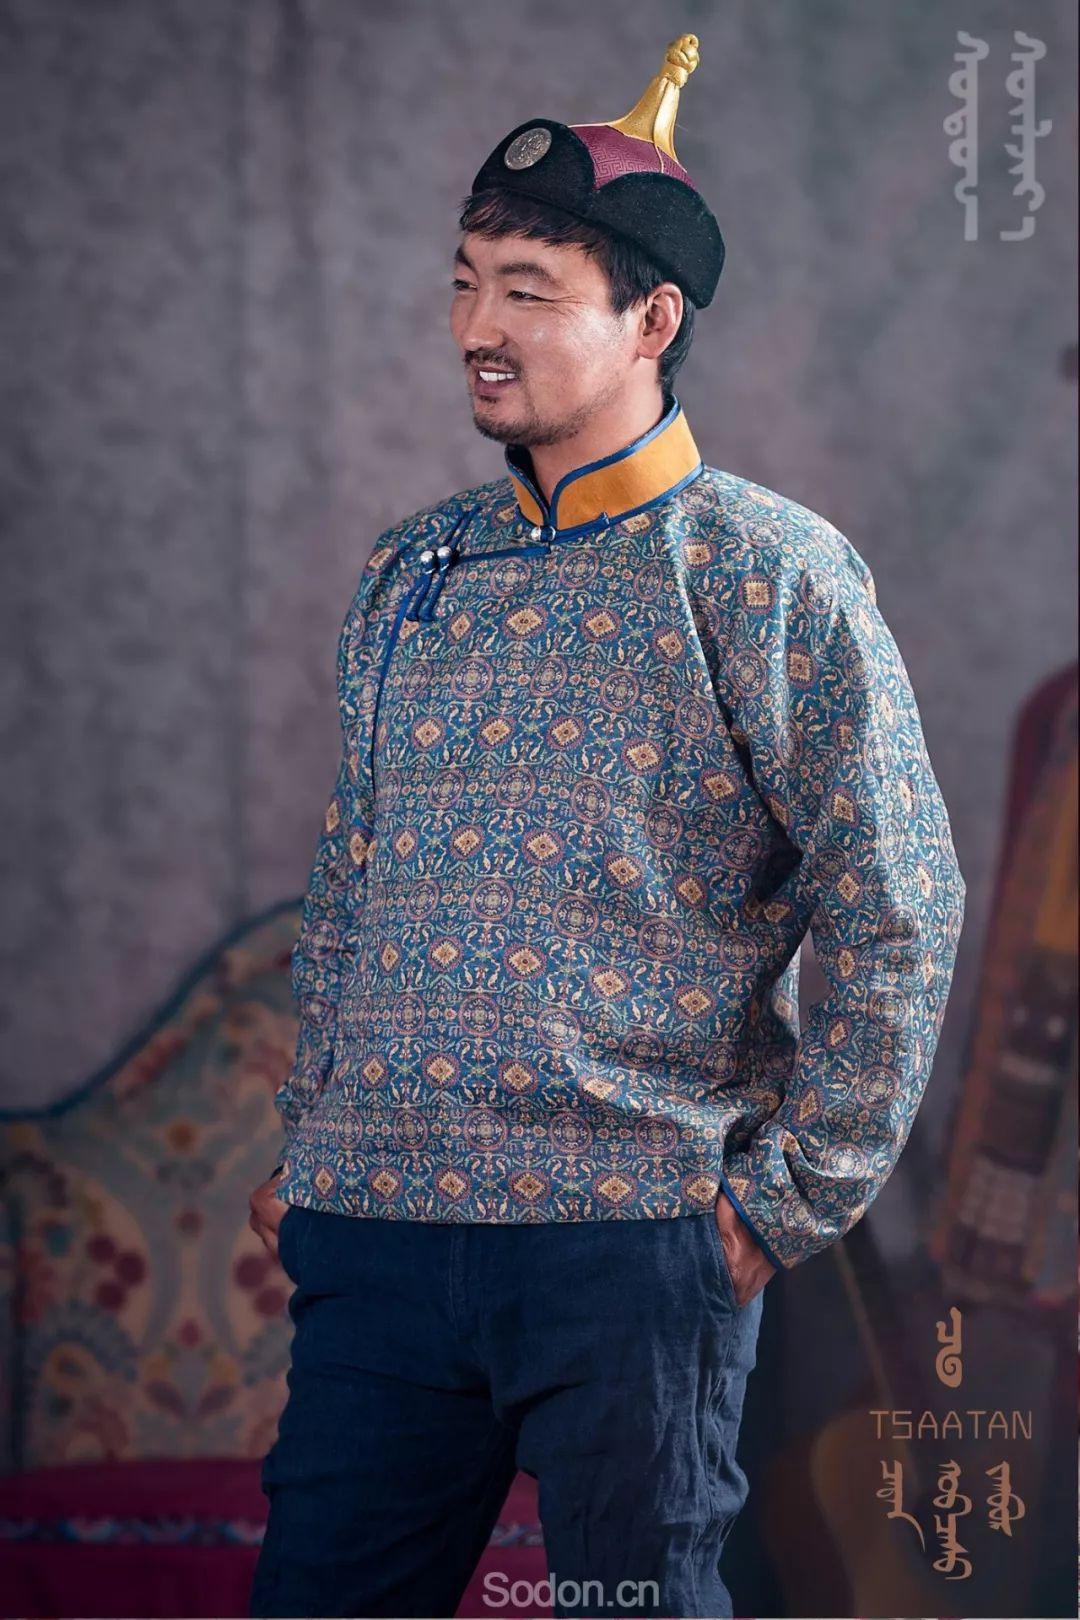 TSAATAN蒙古时装 2019夏季新款首发 第11张